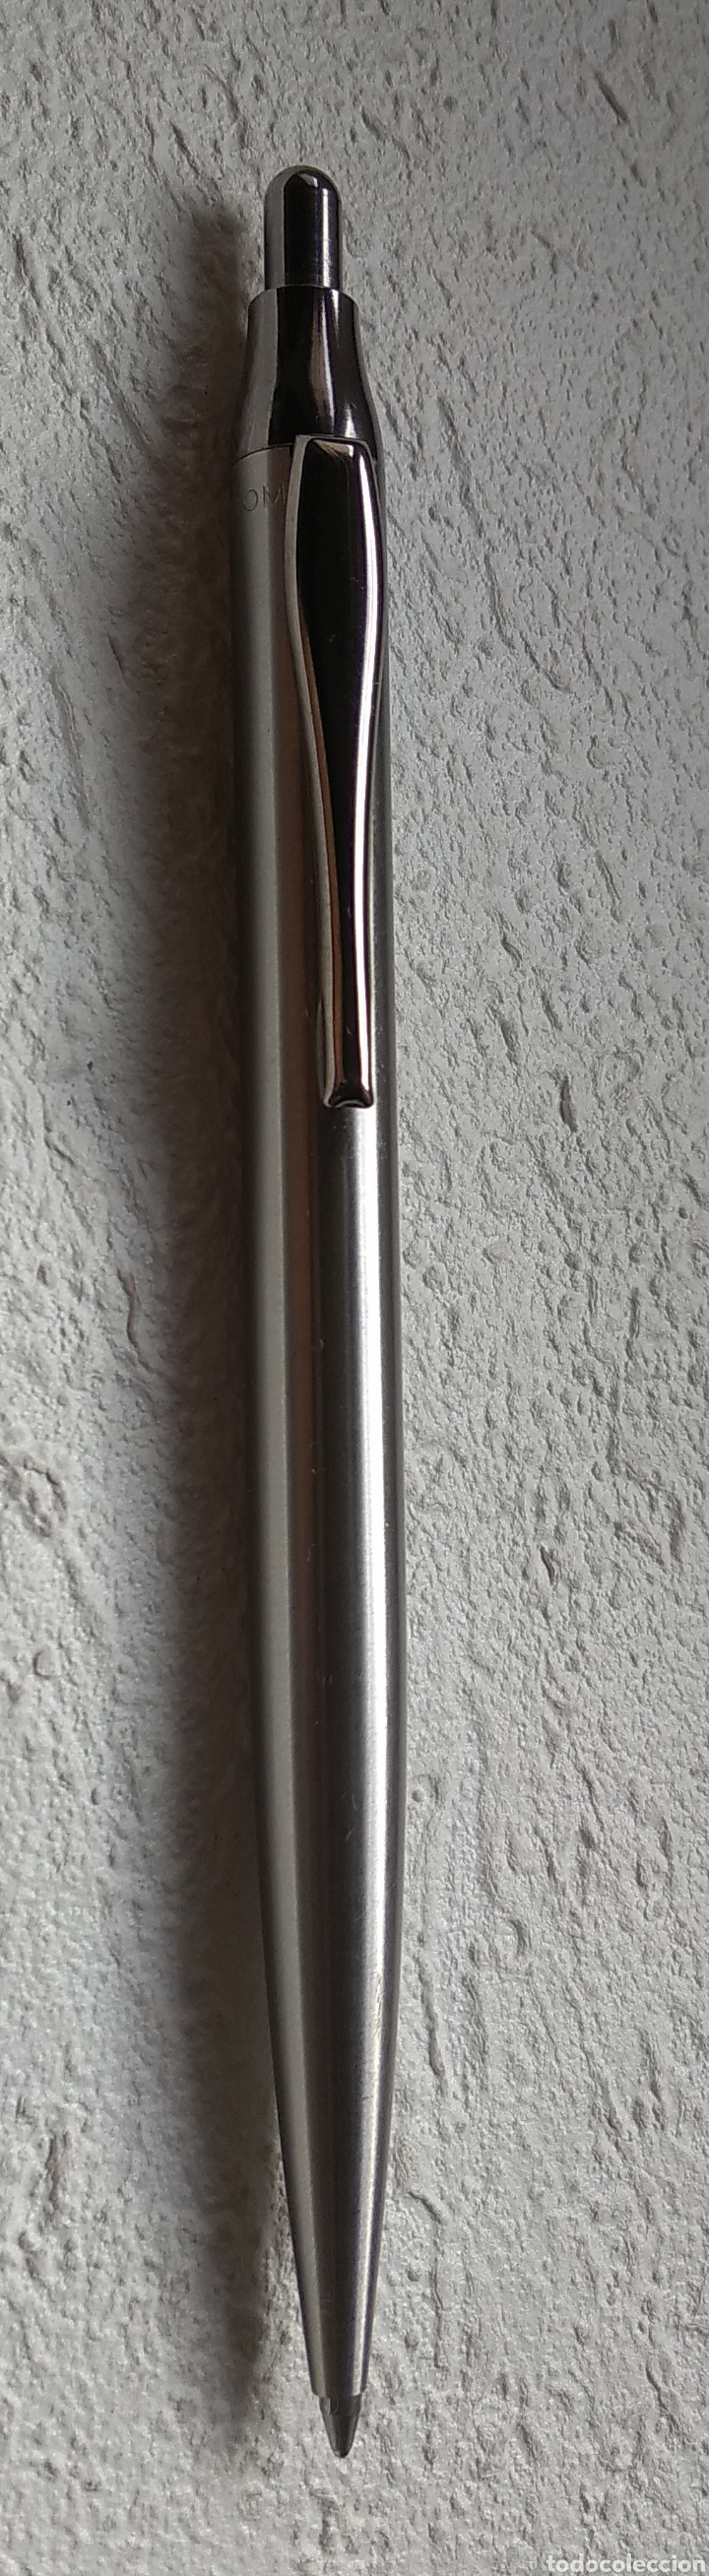 Bolígrafos antiguos: Bolígrafo INOXCROM - Foto 2 - 208660340